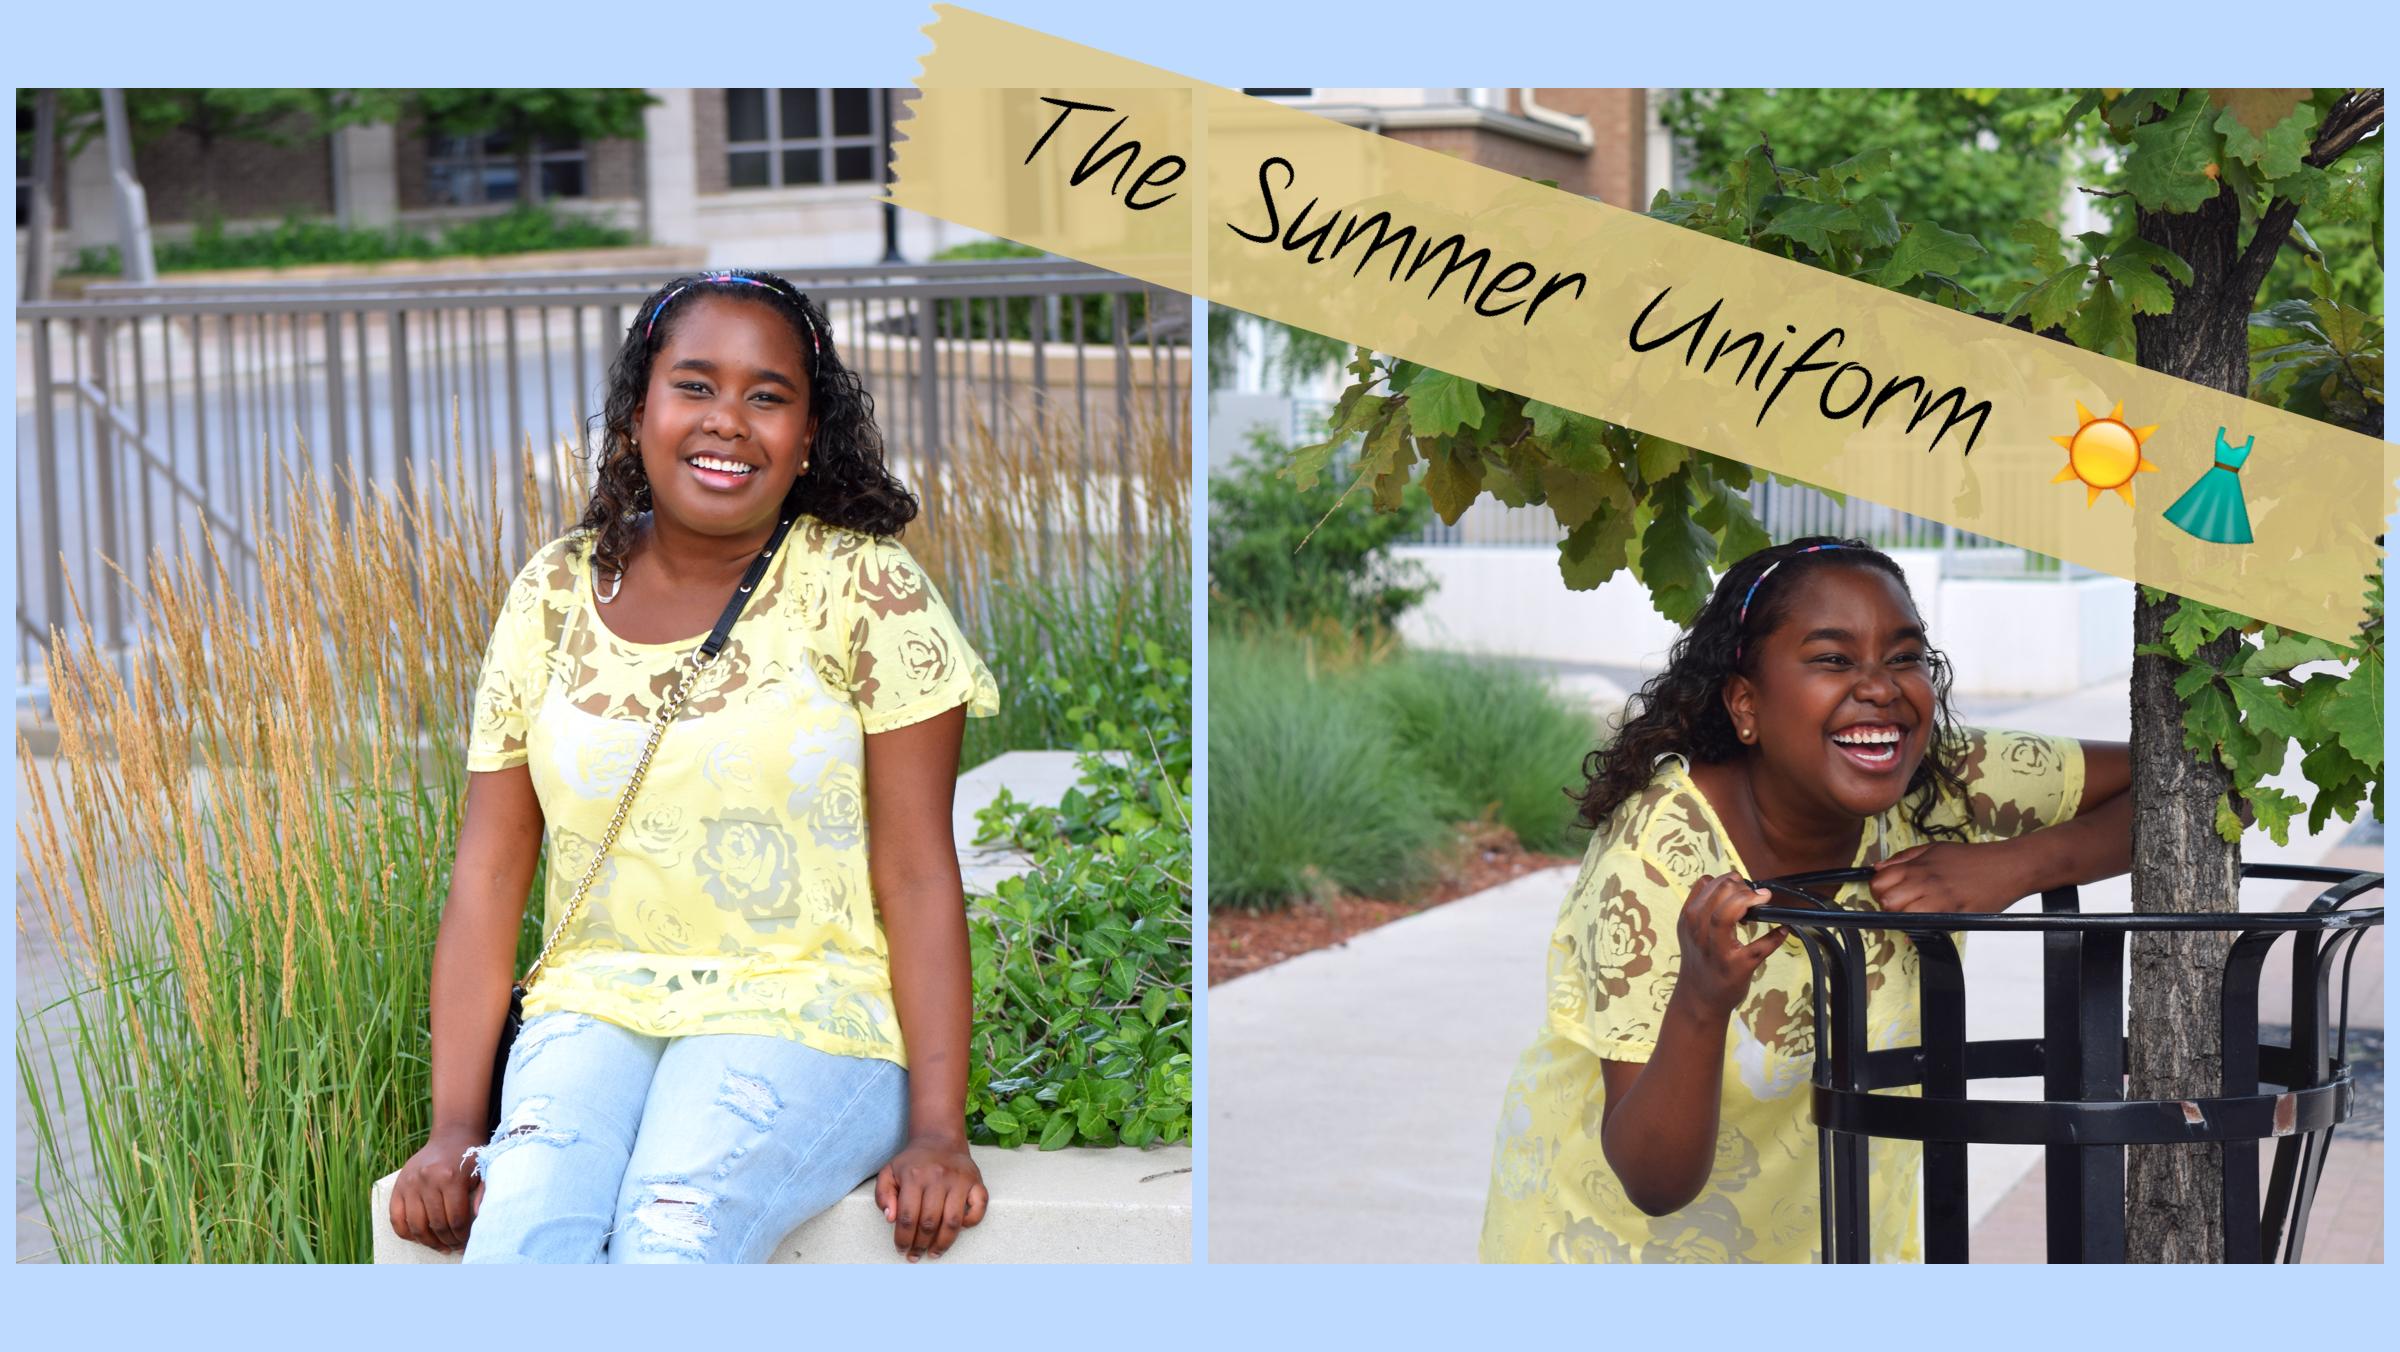 The Summer Uniform